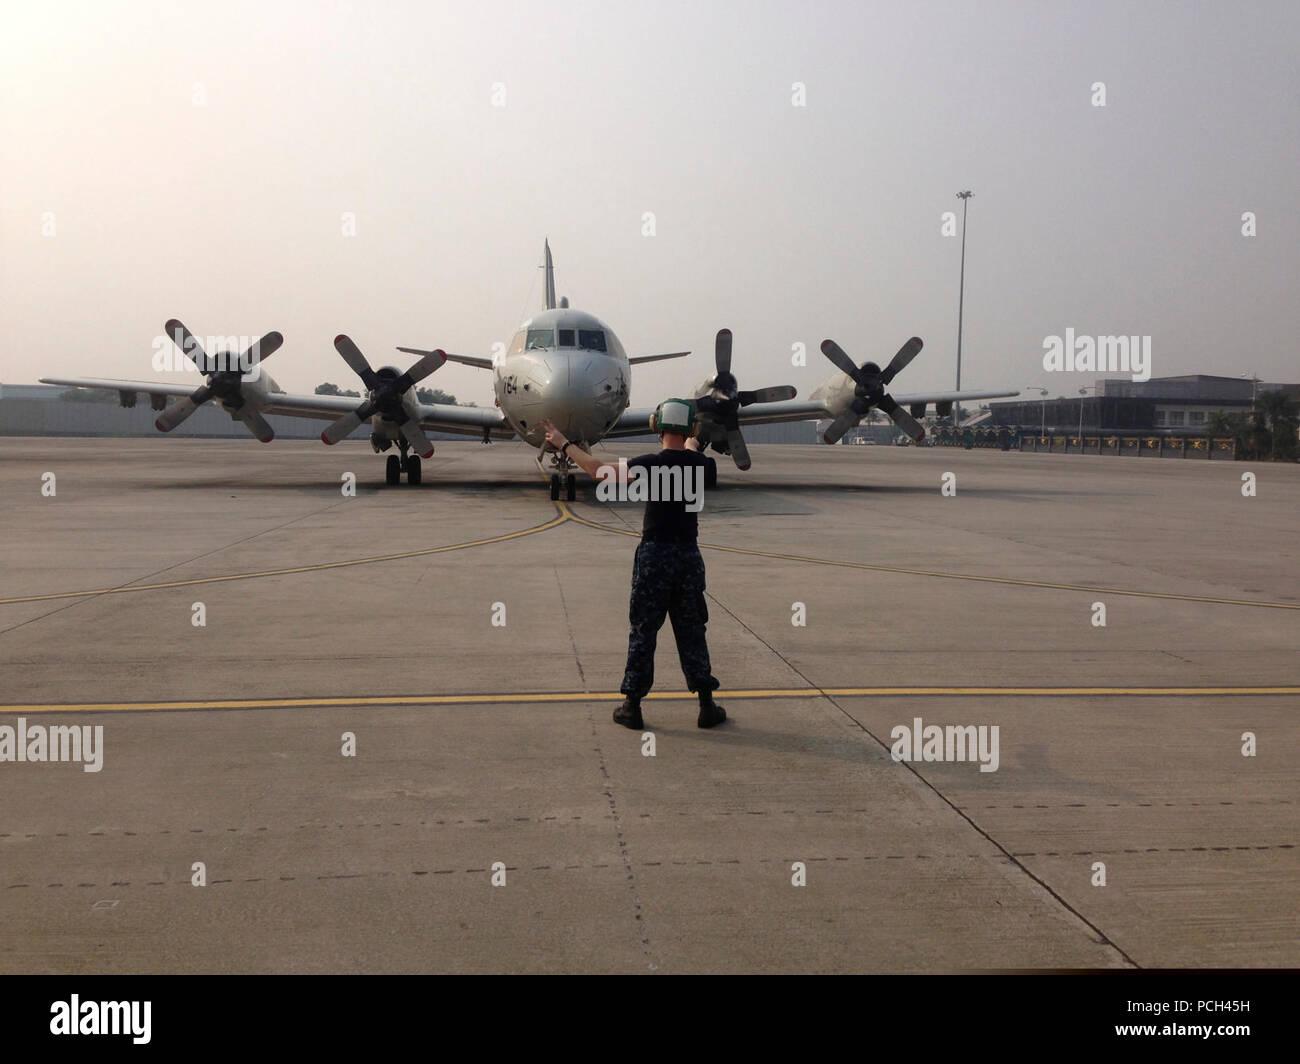 Malaysia Airlines Flight 370 Stock Photos & Malaysia